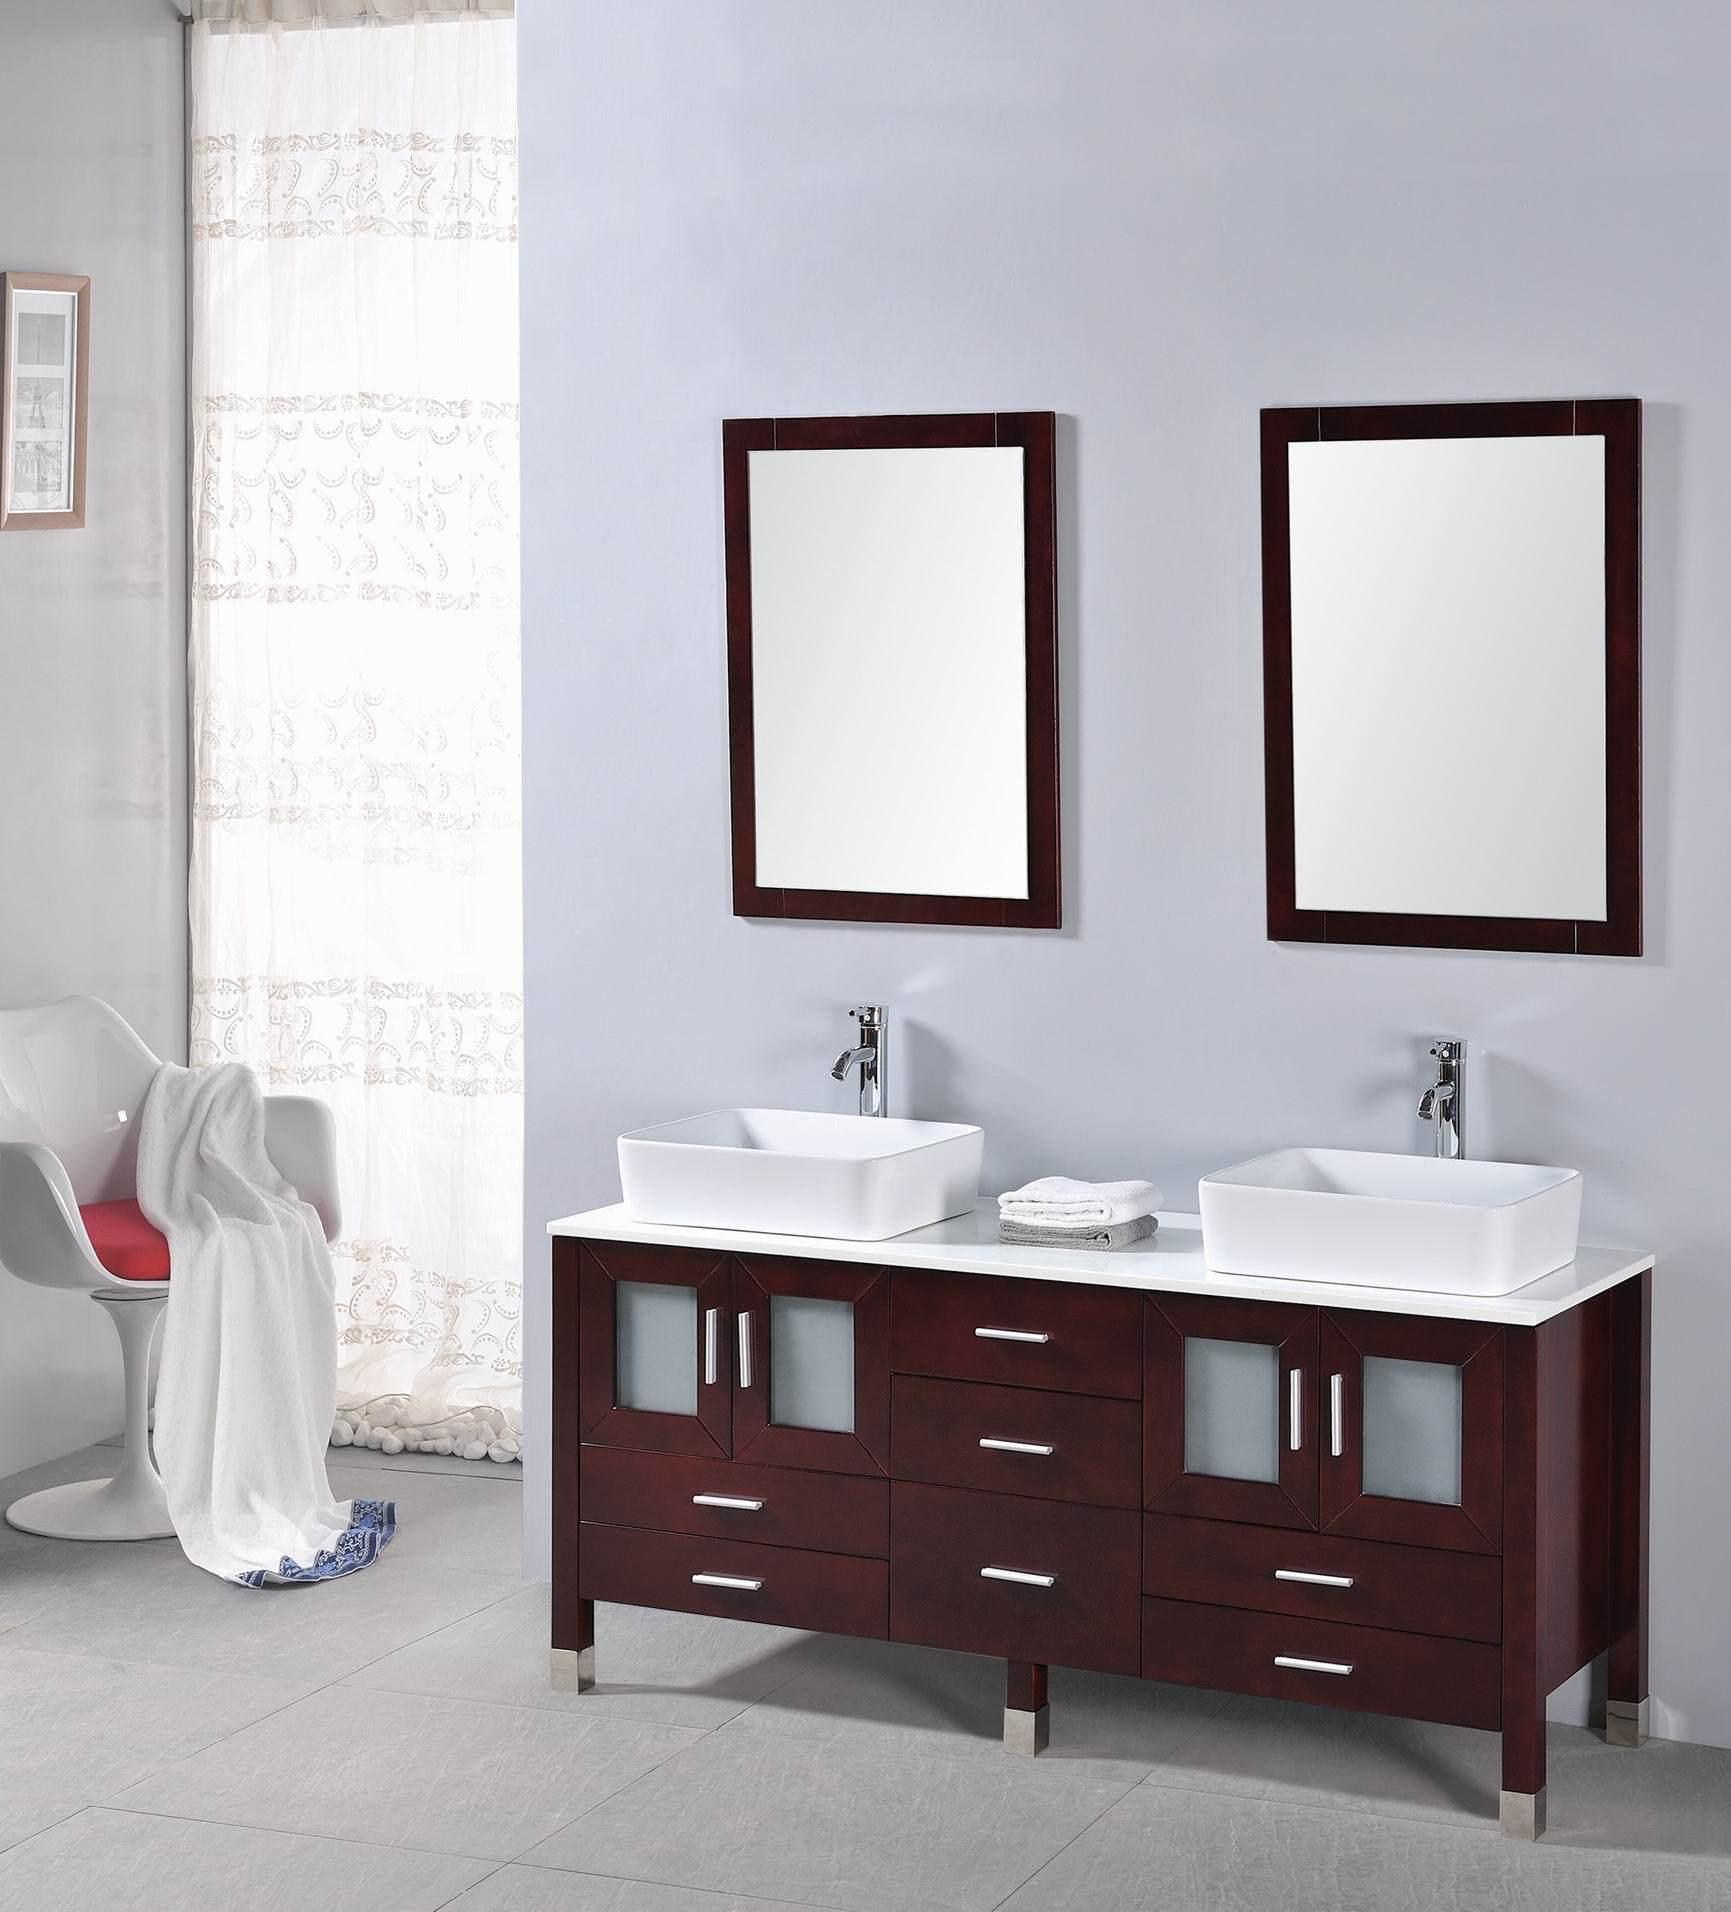 China HiQuality Wood Bathroom Vanity OSL8646  China